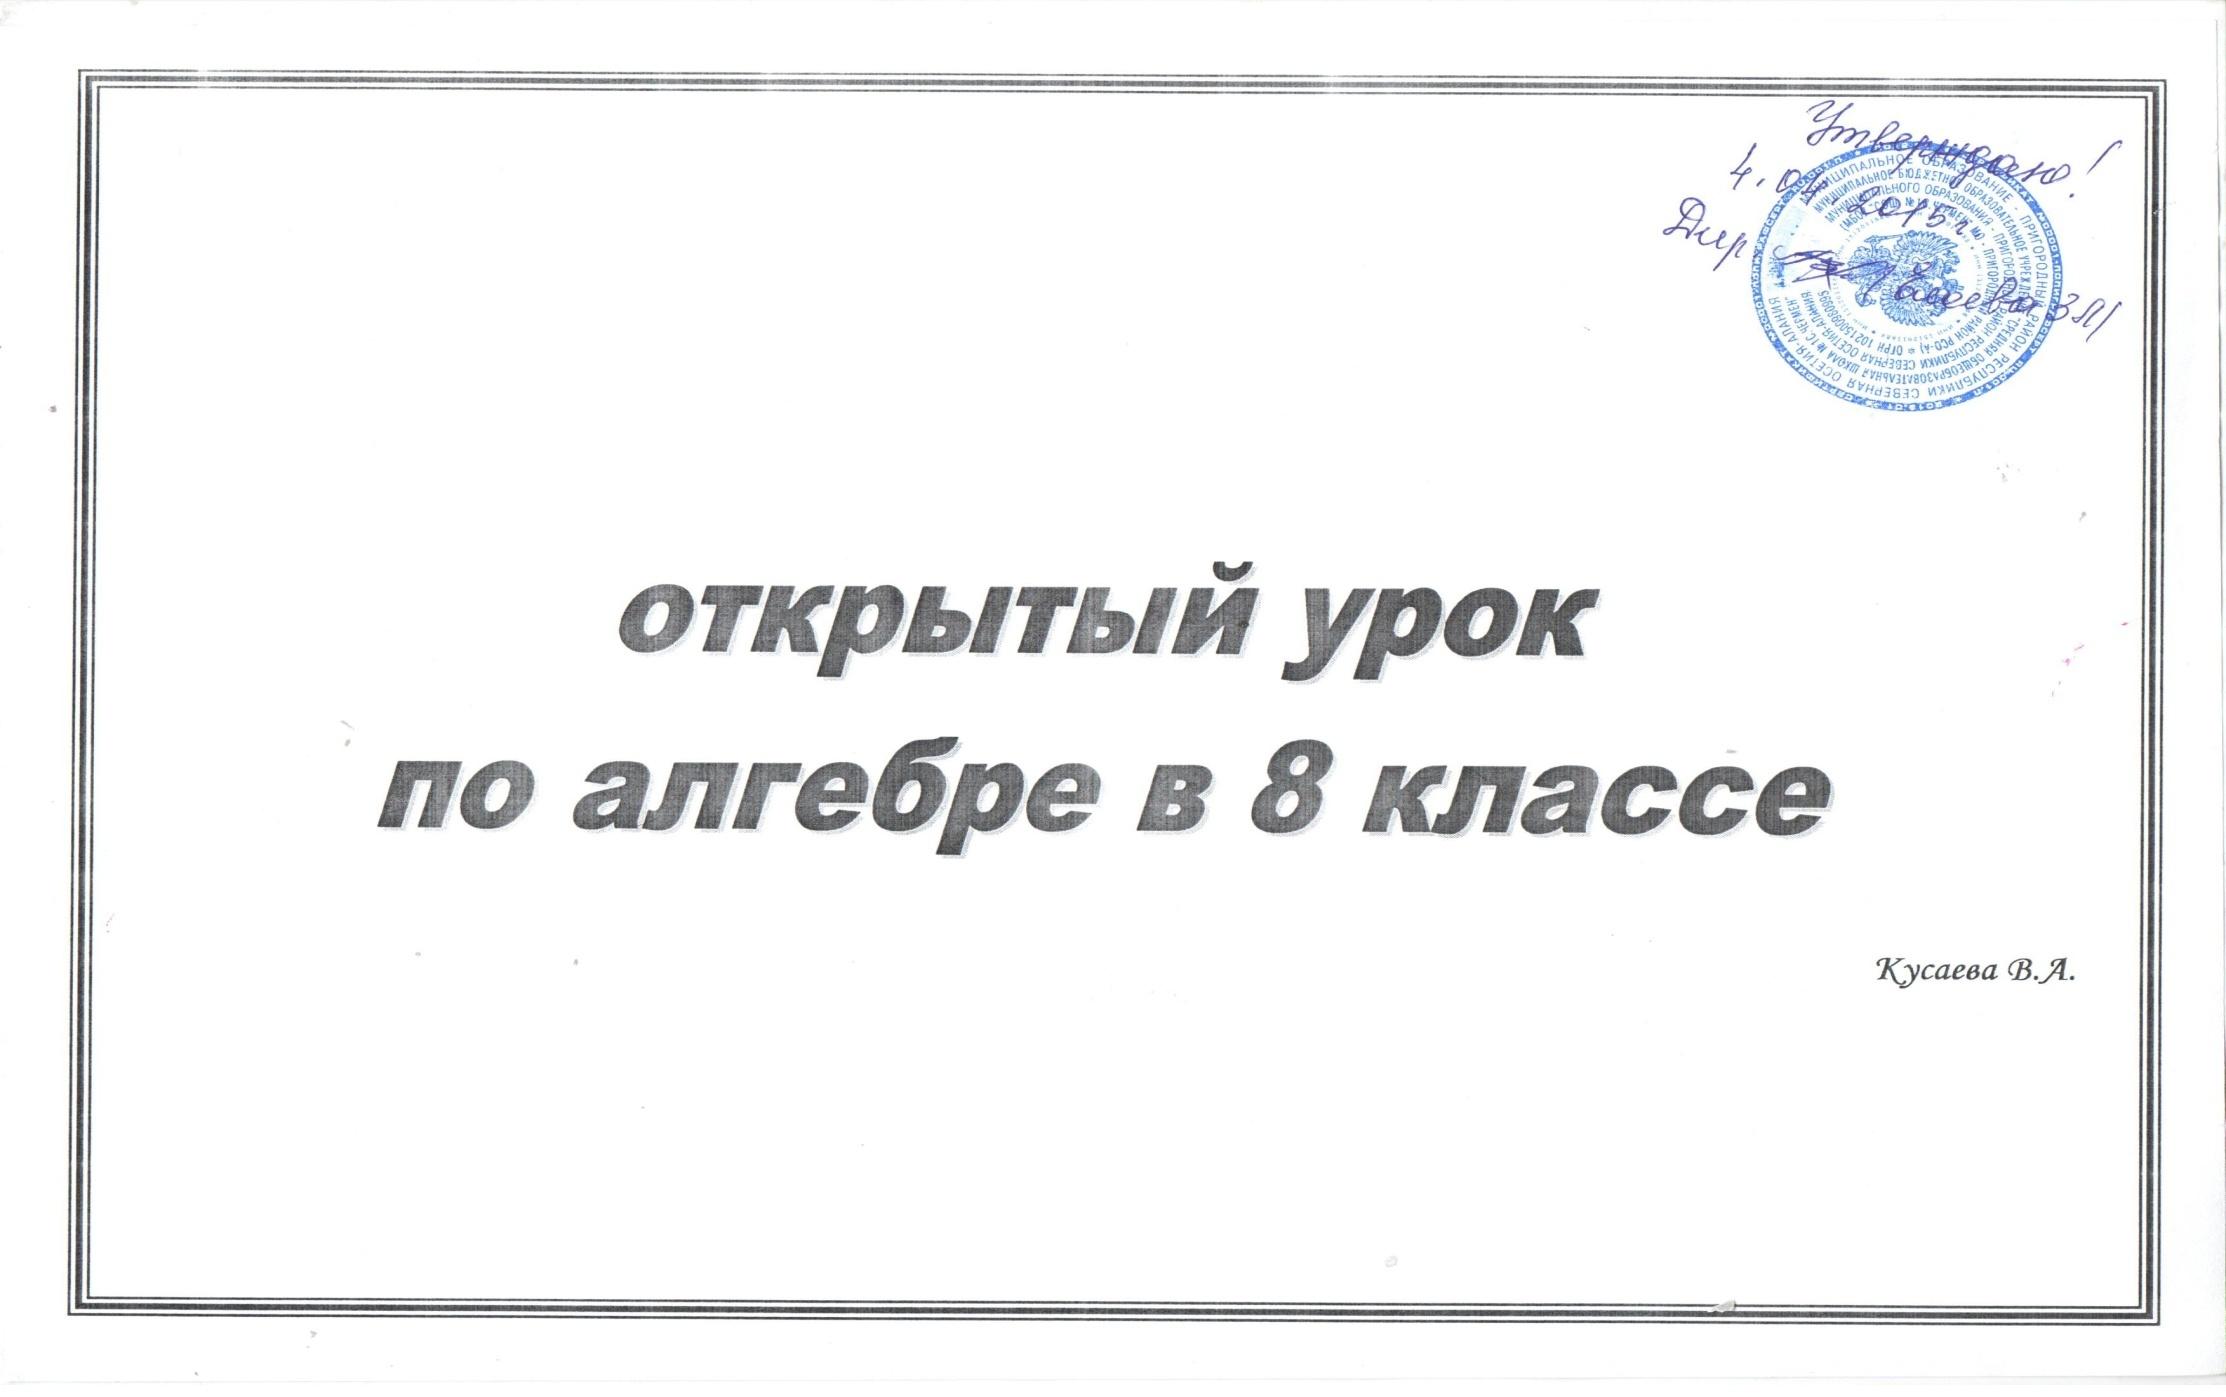 C:\Documents and Settings\Школа\Рабочий стол\Кусаева Вероника Асланбековна\Изображение 019.jpg